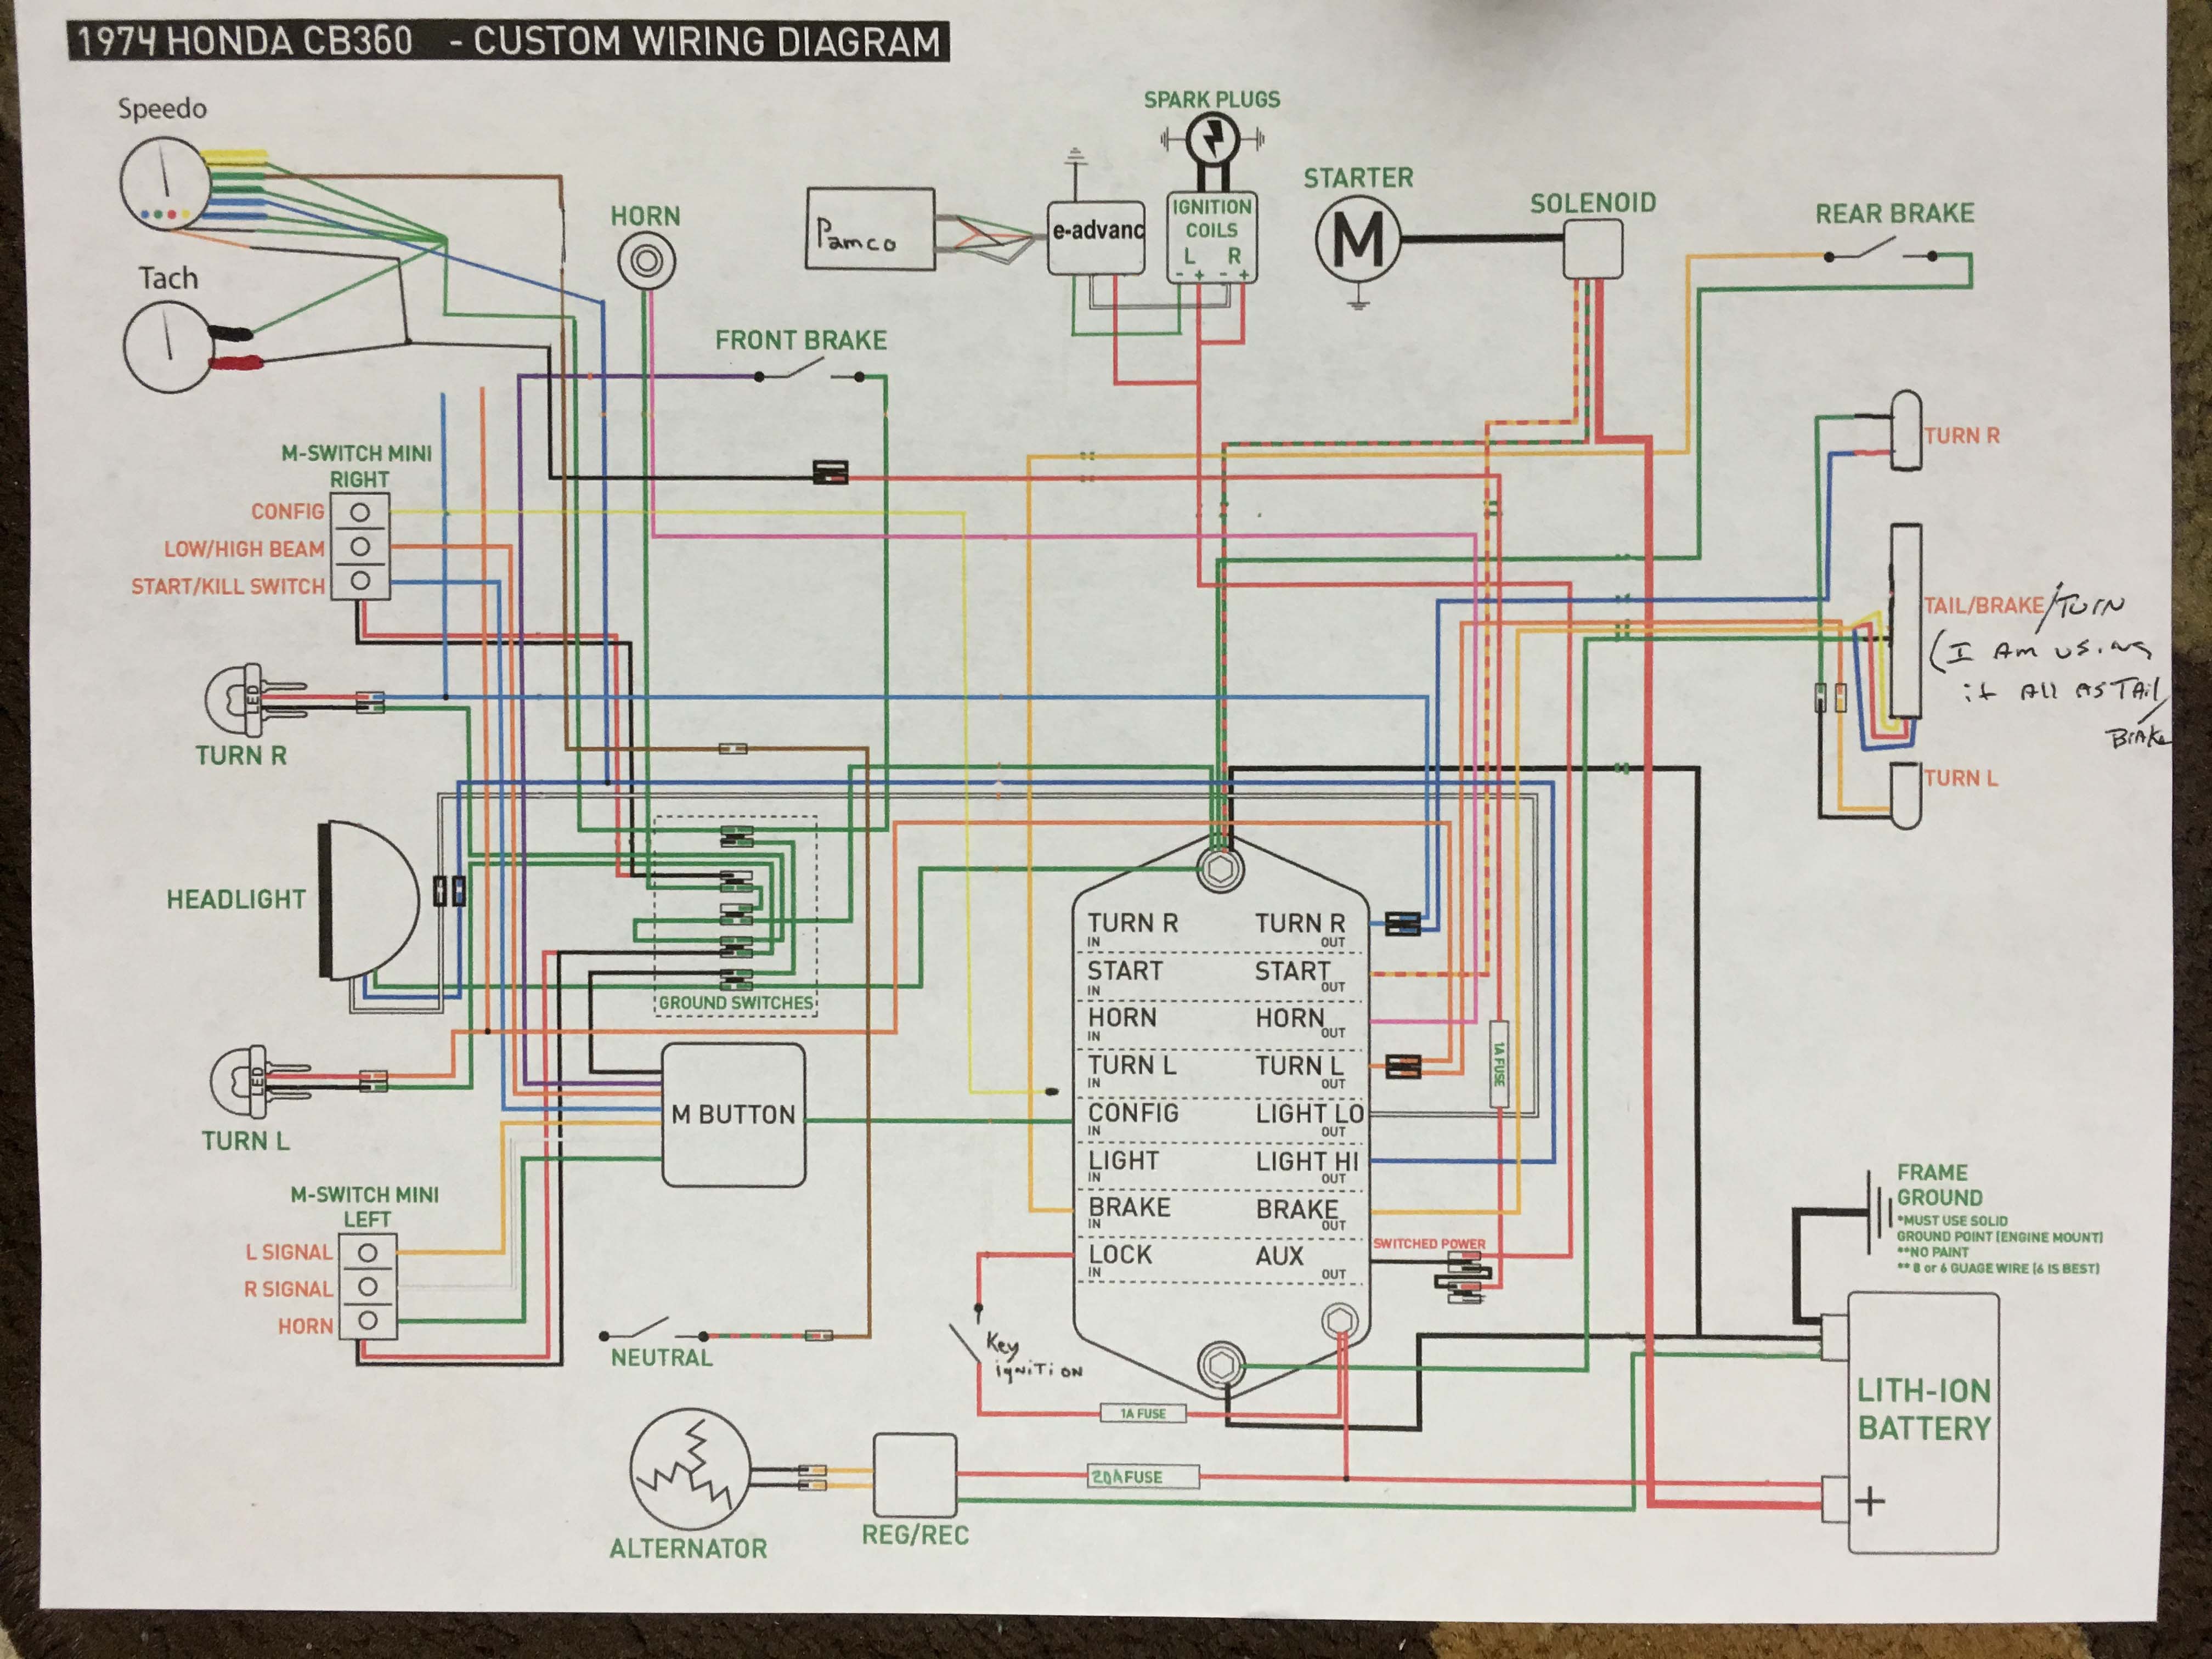 bad boy wiring diagram 2012 honda cb360 custom wiring cafe racer forum  honda cb360 custom wiring cafe racer